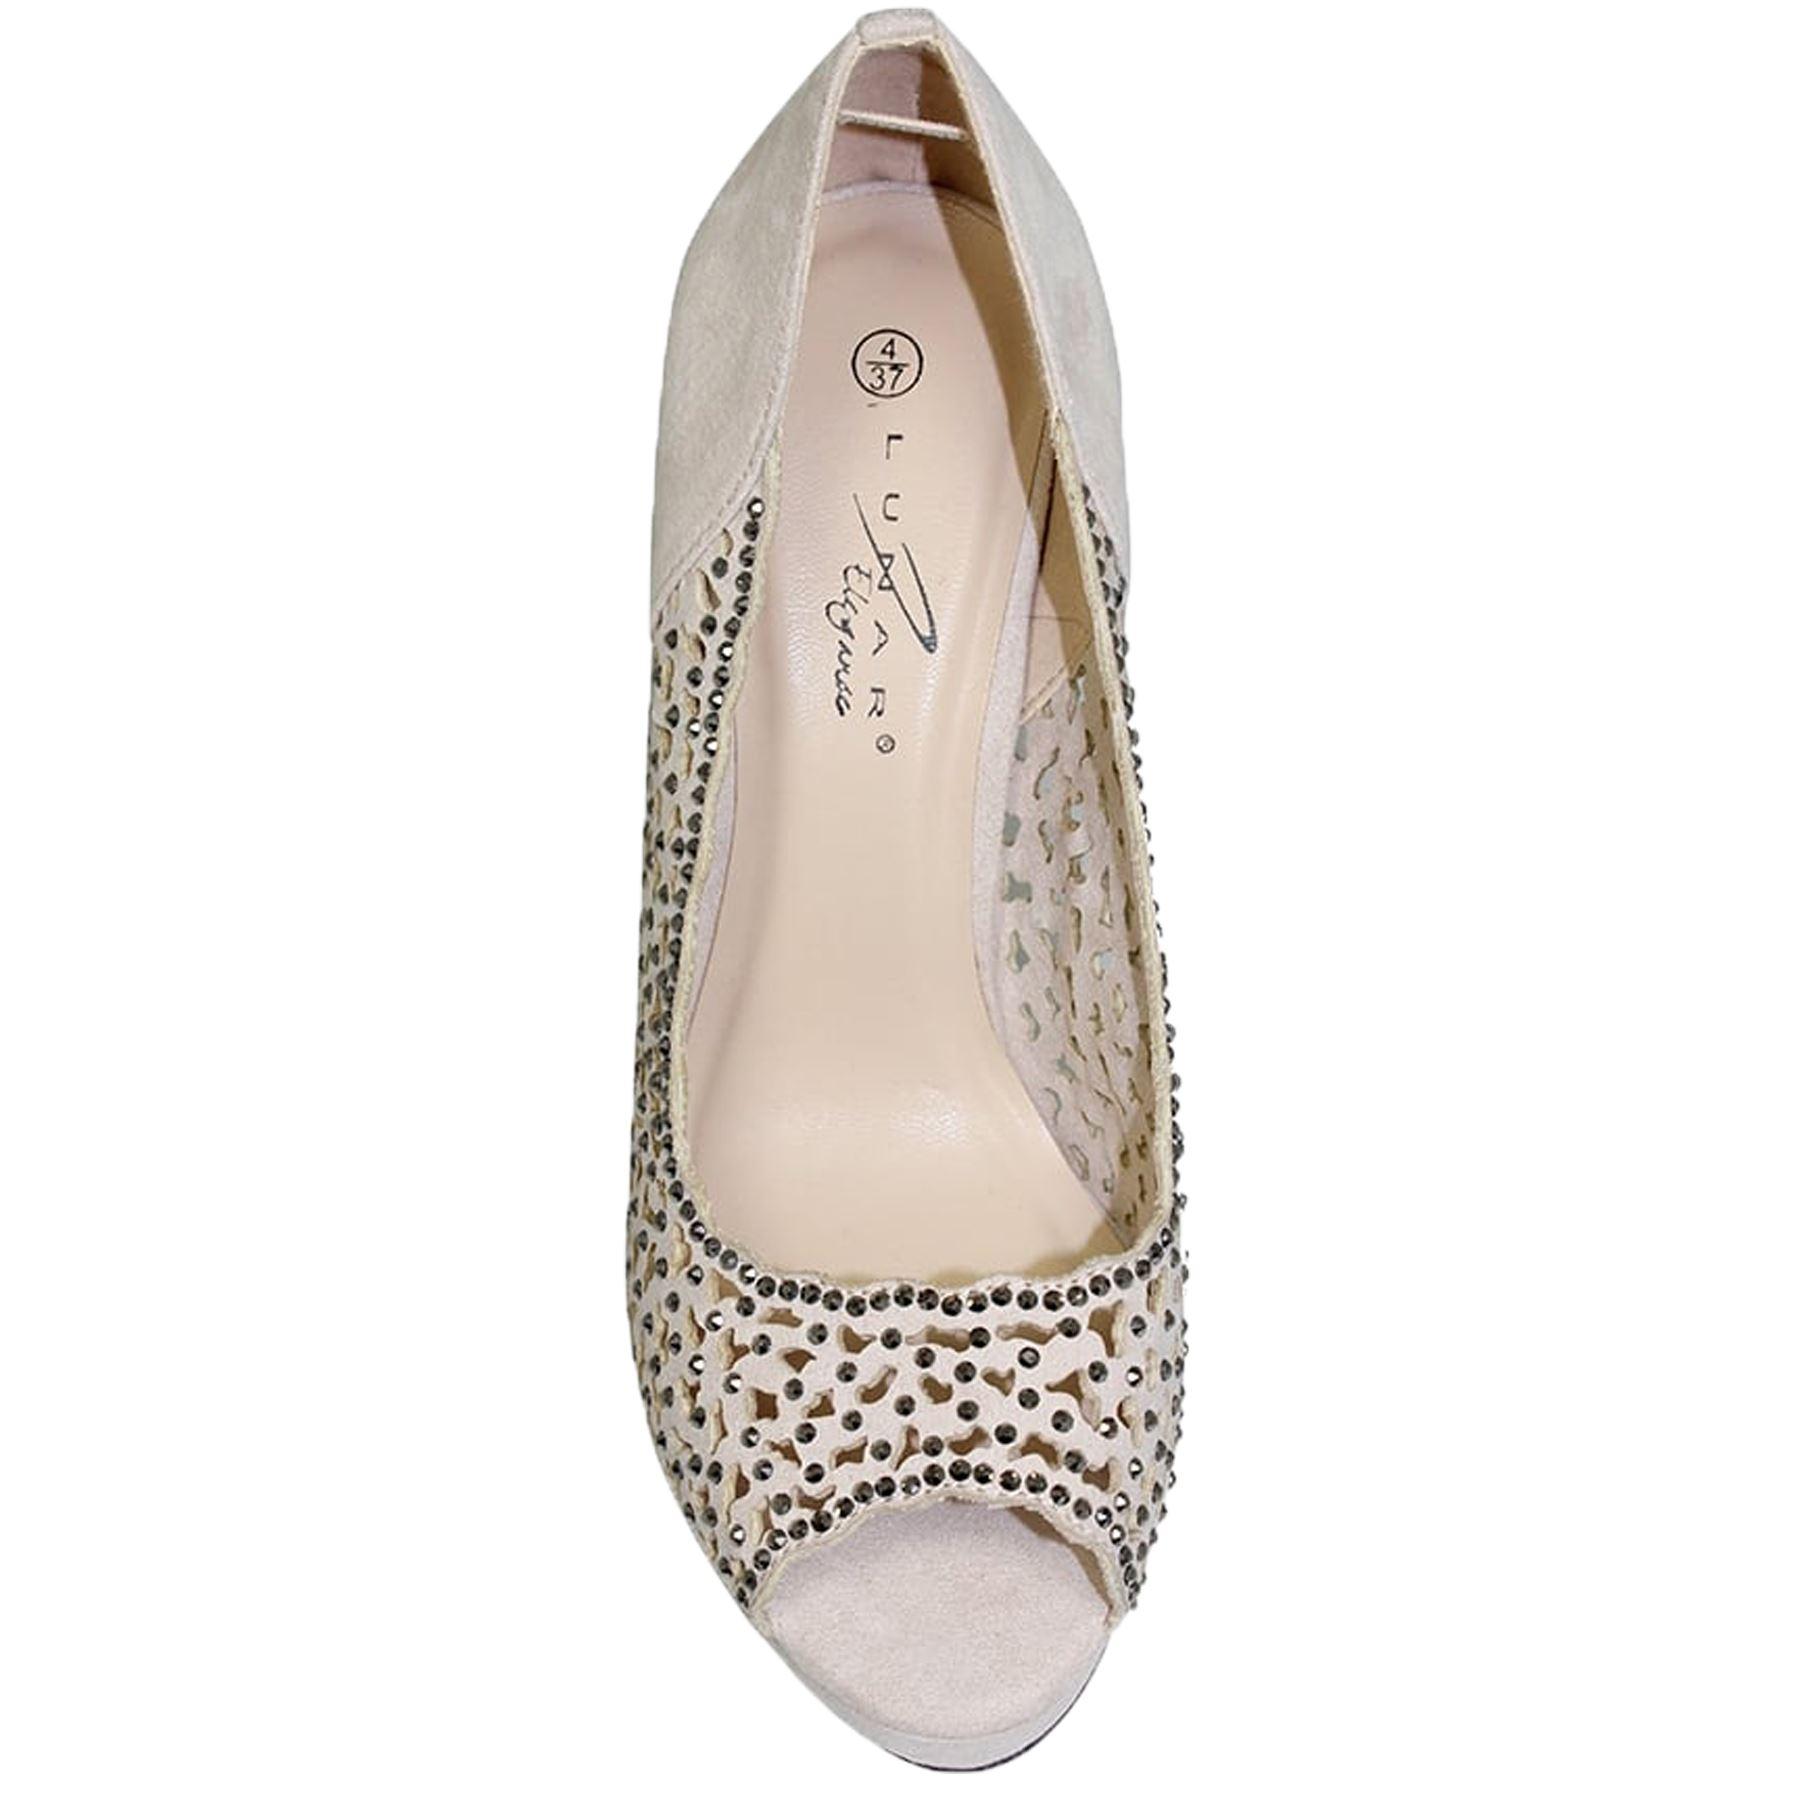 FLR445 Margo Diamante Glamorous Court Peep Toe Heels Clutch Clasp Bag